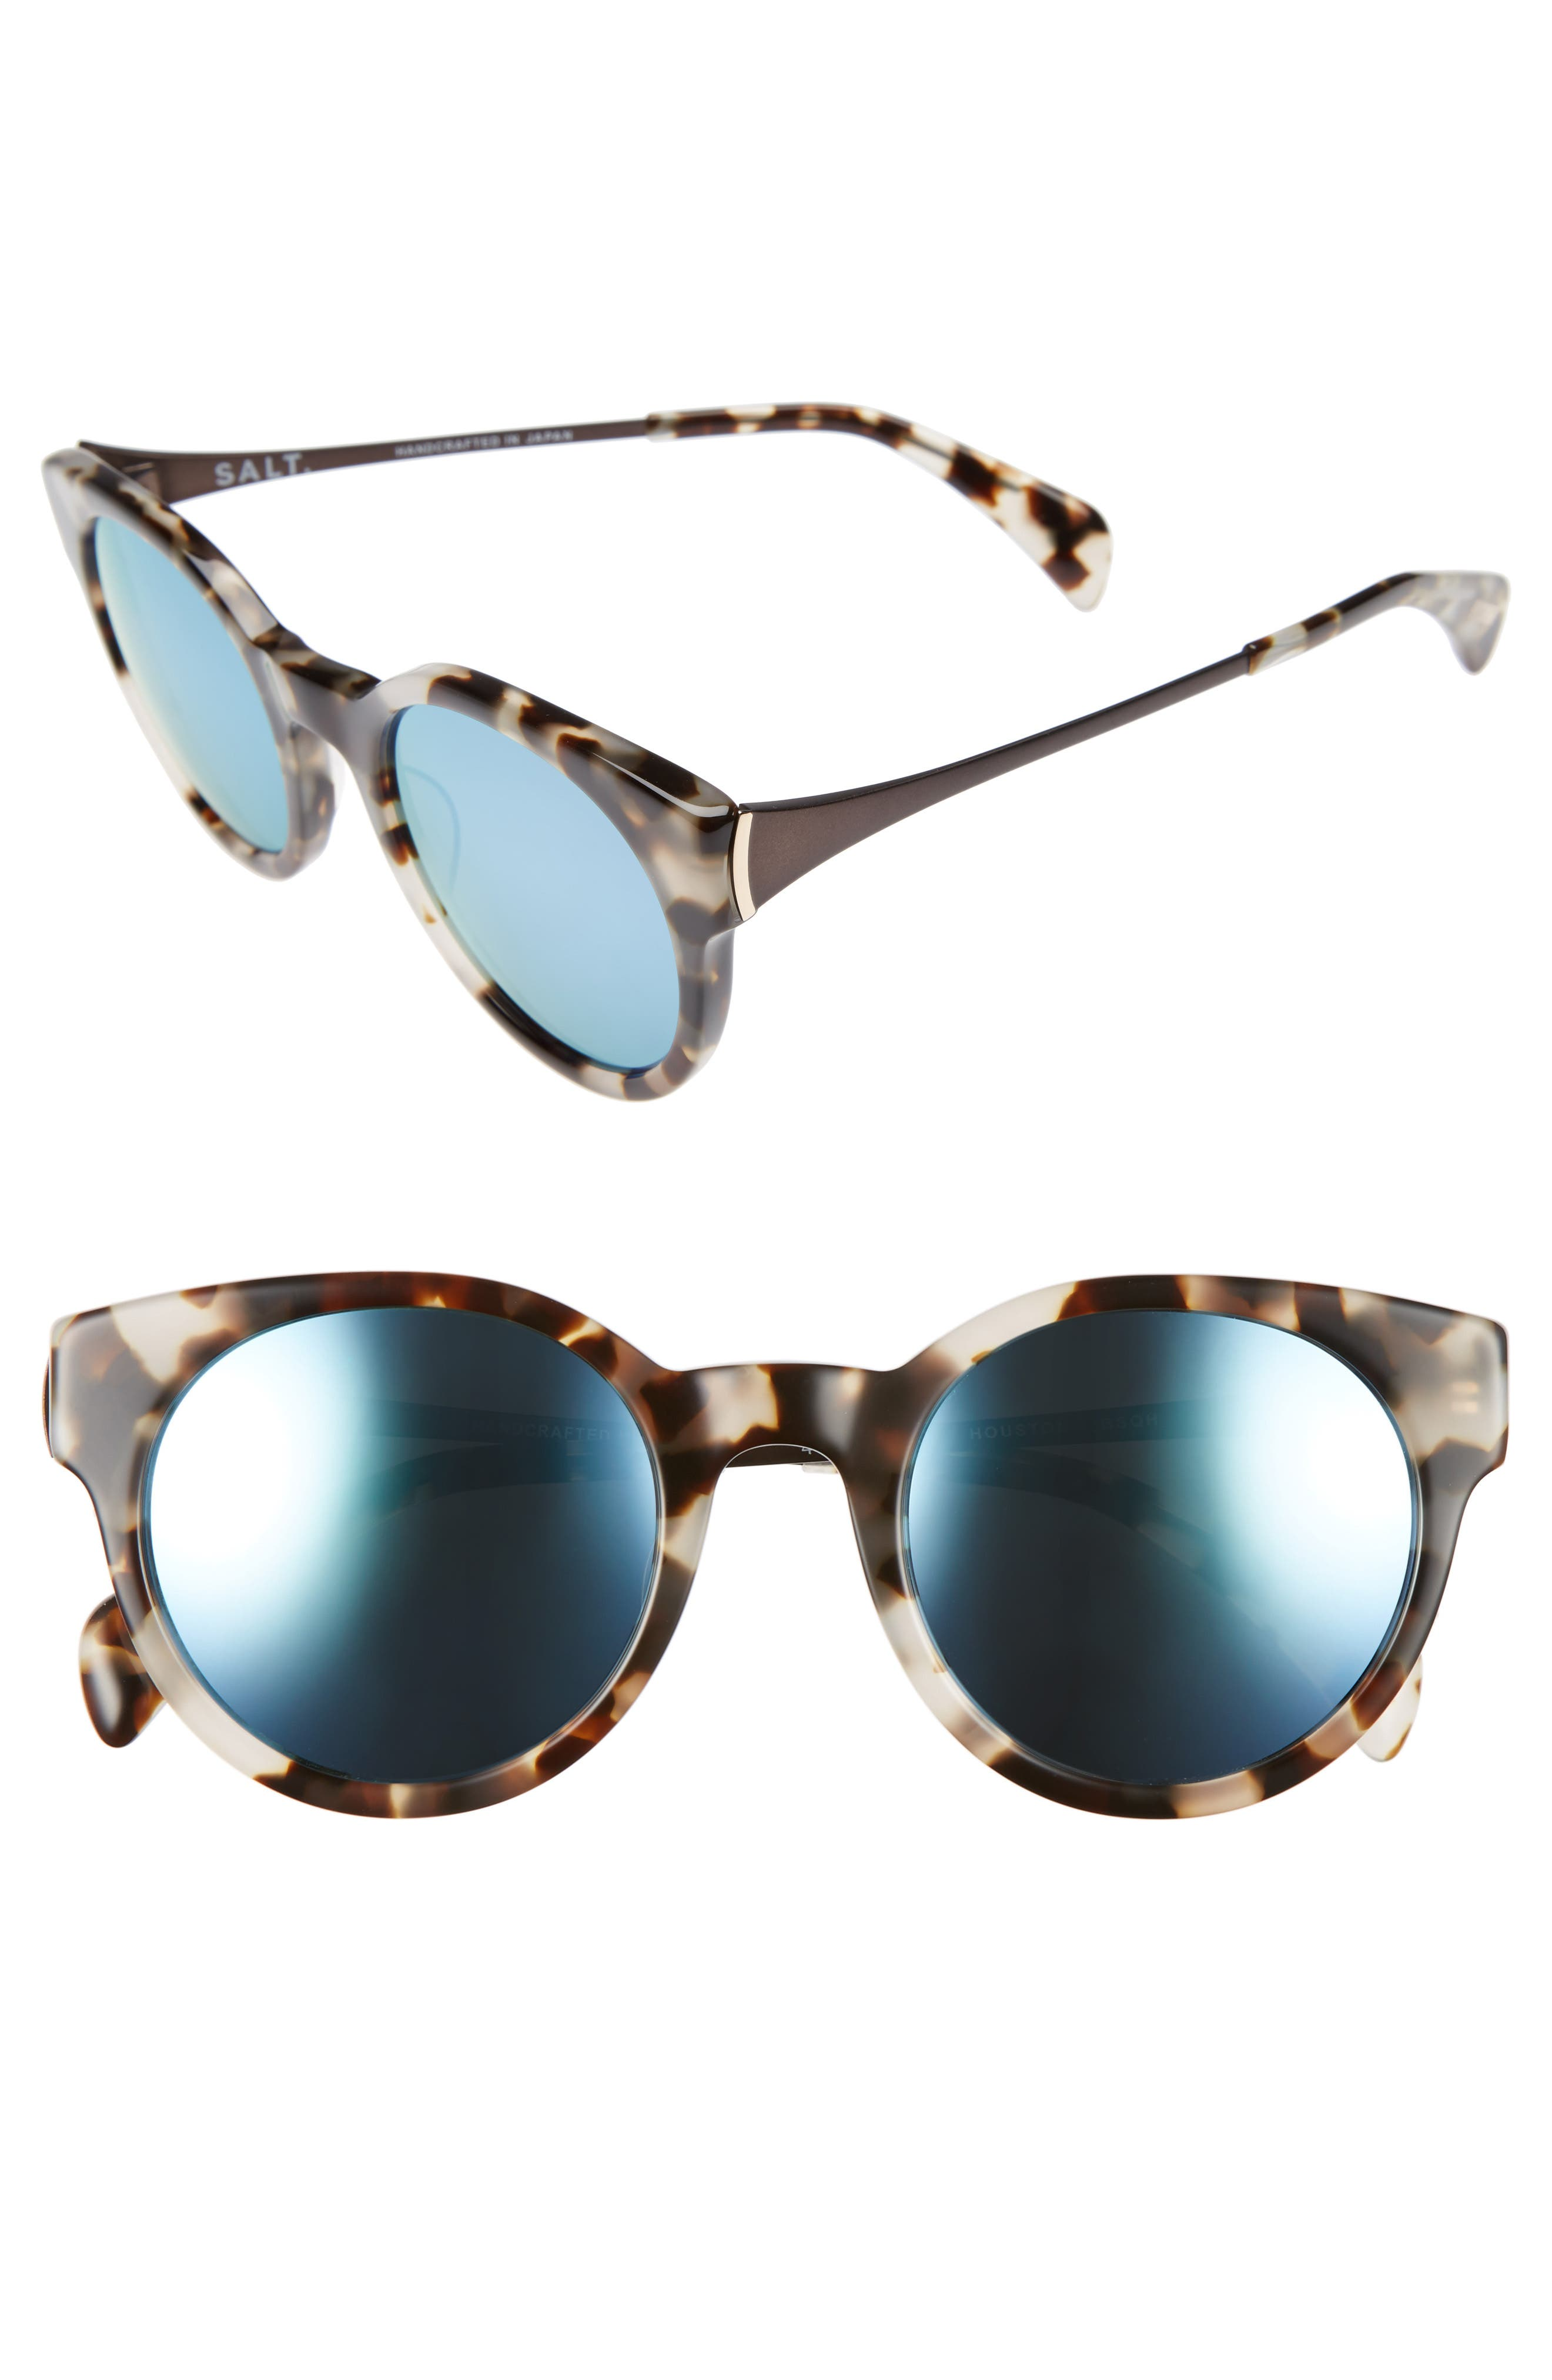 Houston 49mm Polarized Round Sunglasses,                         Main,                         color, BISQUE HAVANA/ BLUE MIRROR